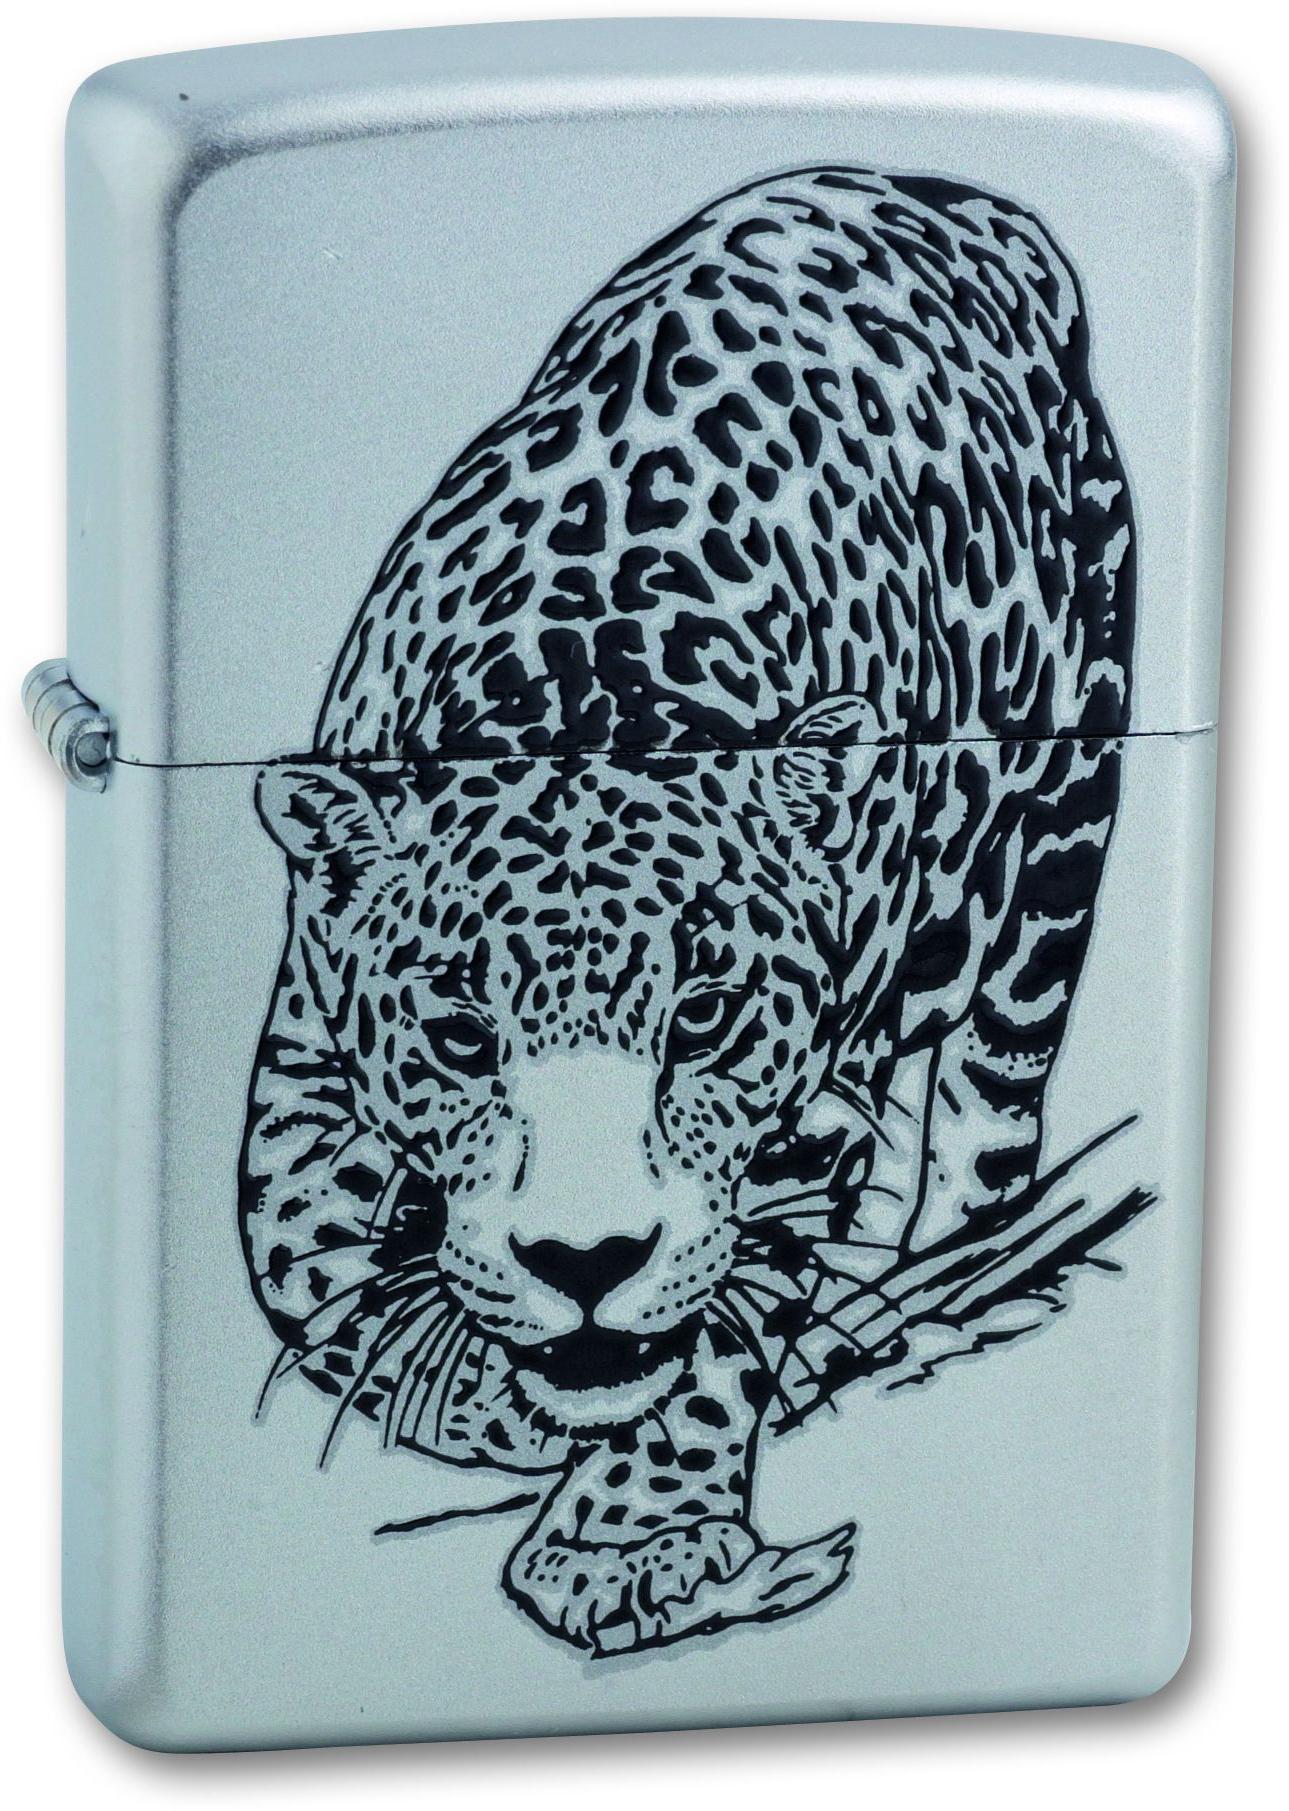 ��������� ZIPPO Leopard Satin Chrome, ������ � ������-�������� ������., ������., �������, 36�56�12��